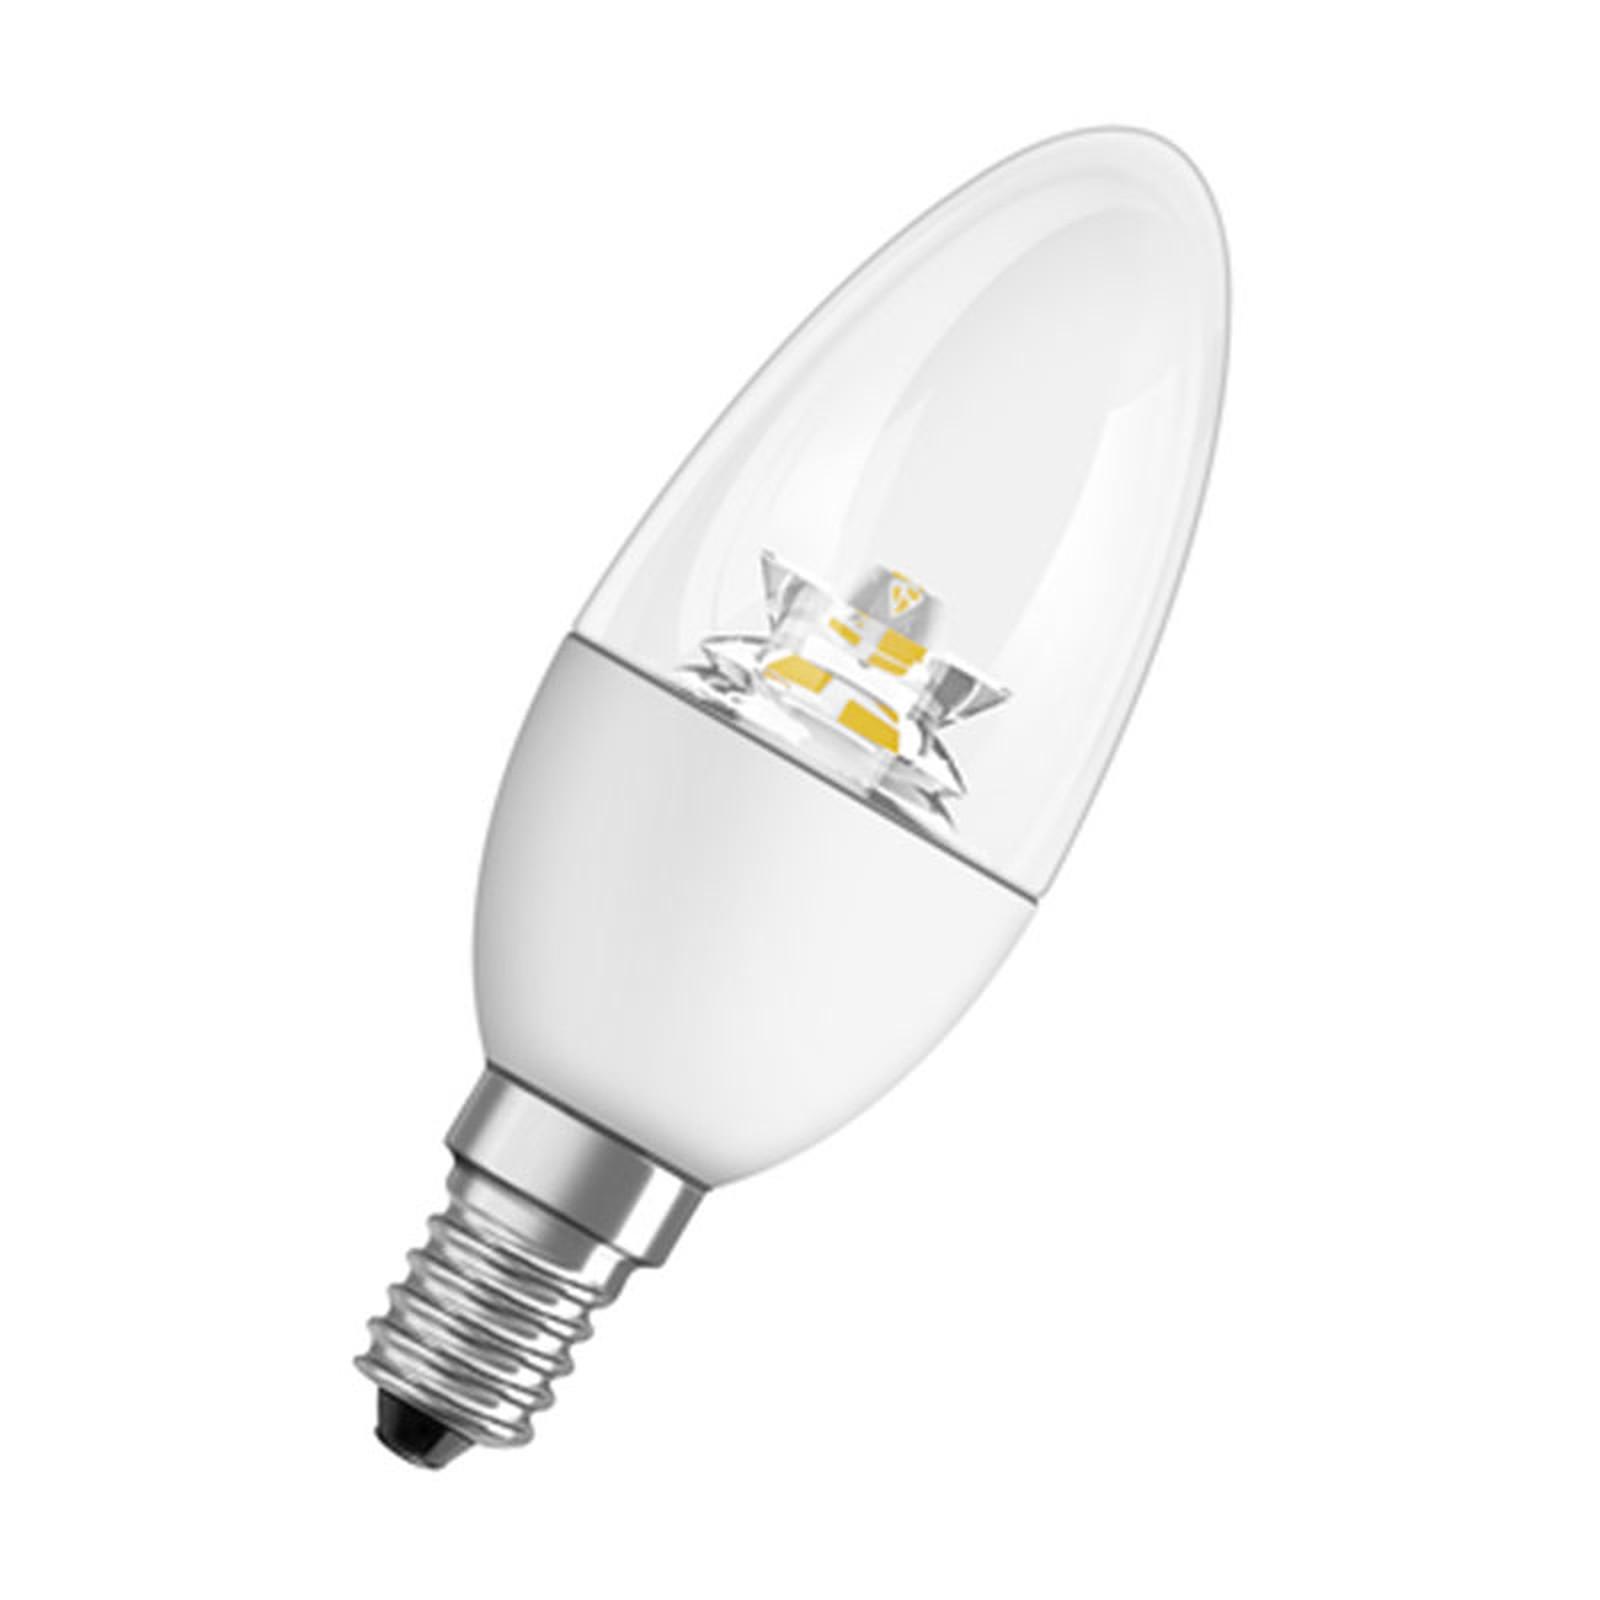 OSRAM Ampoule LED Star Classic flamme E14 6W (40W) A+